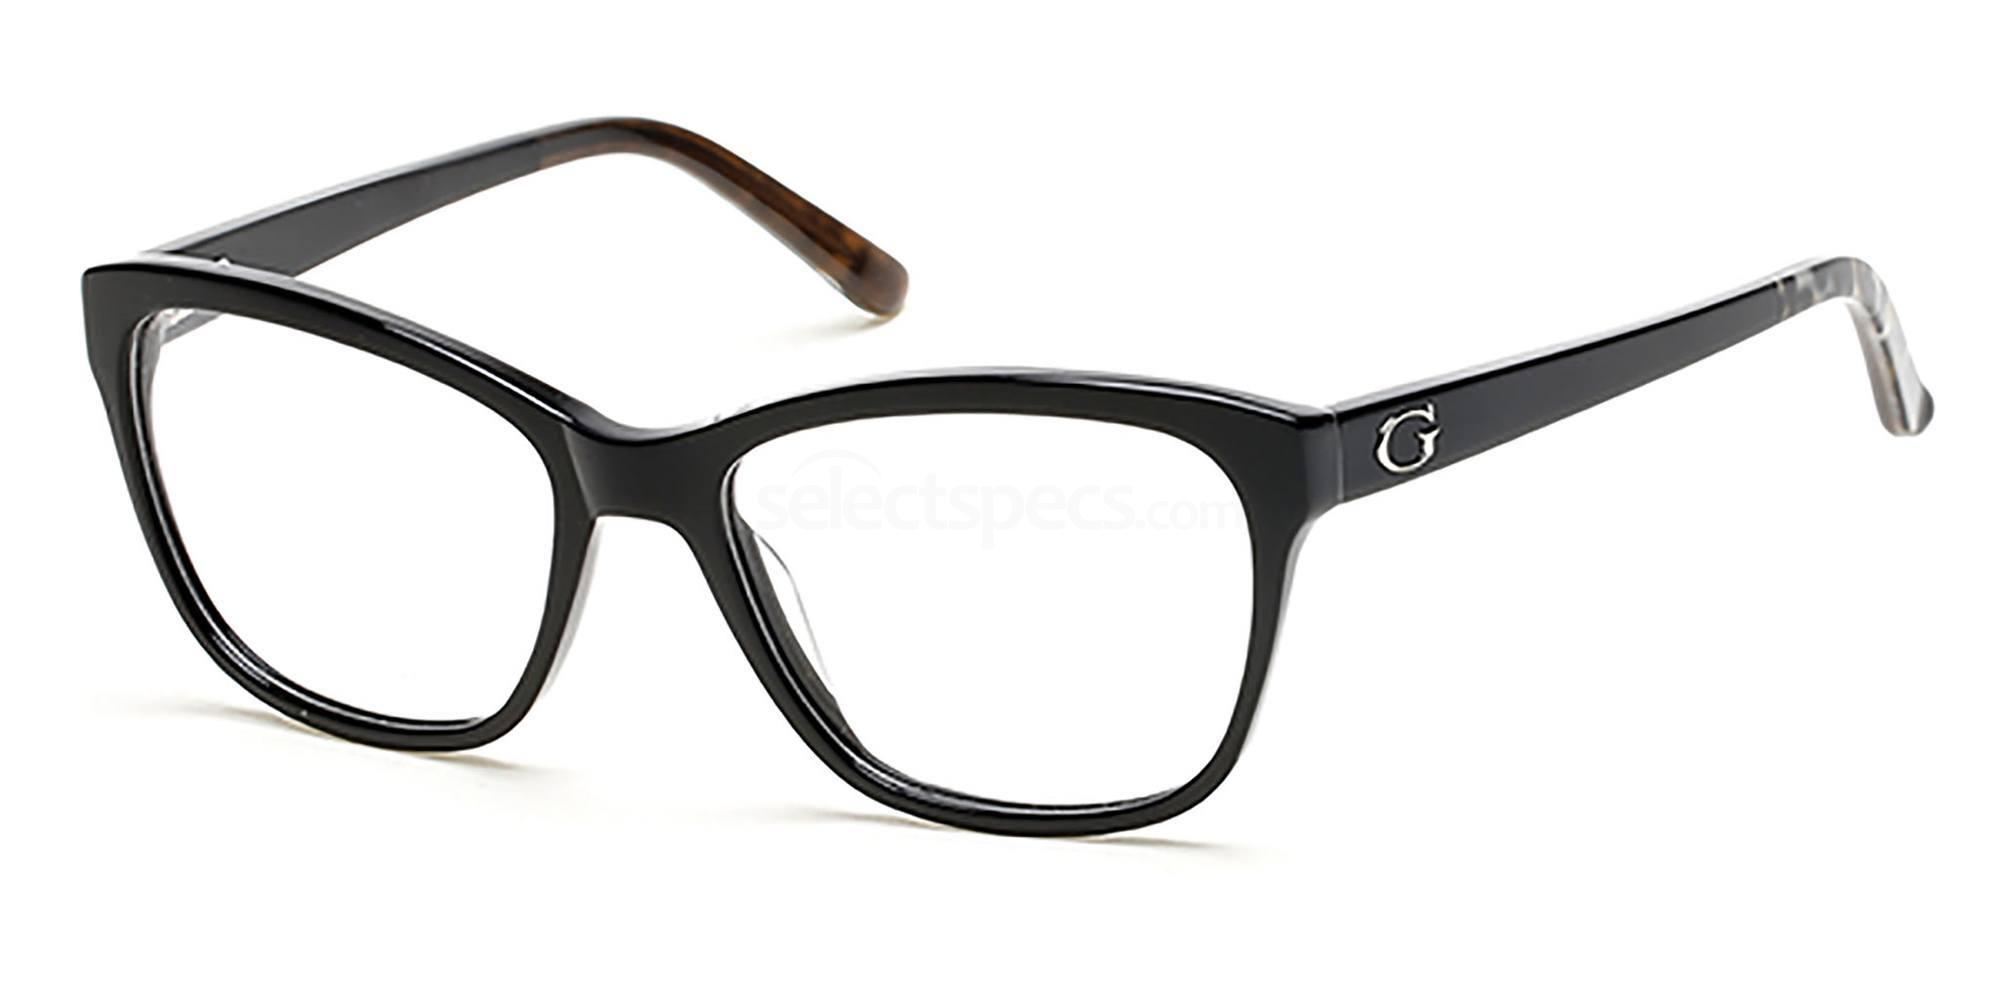 001 GU2541 Glasses, Guess